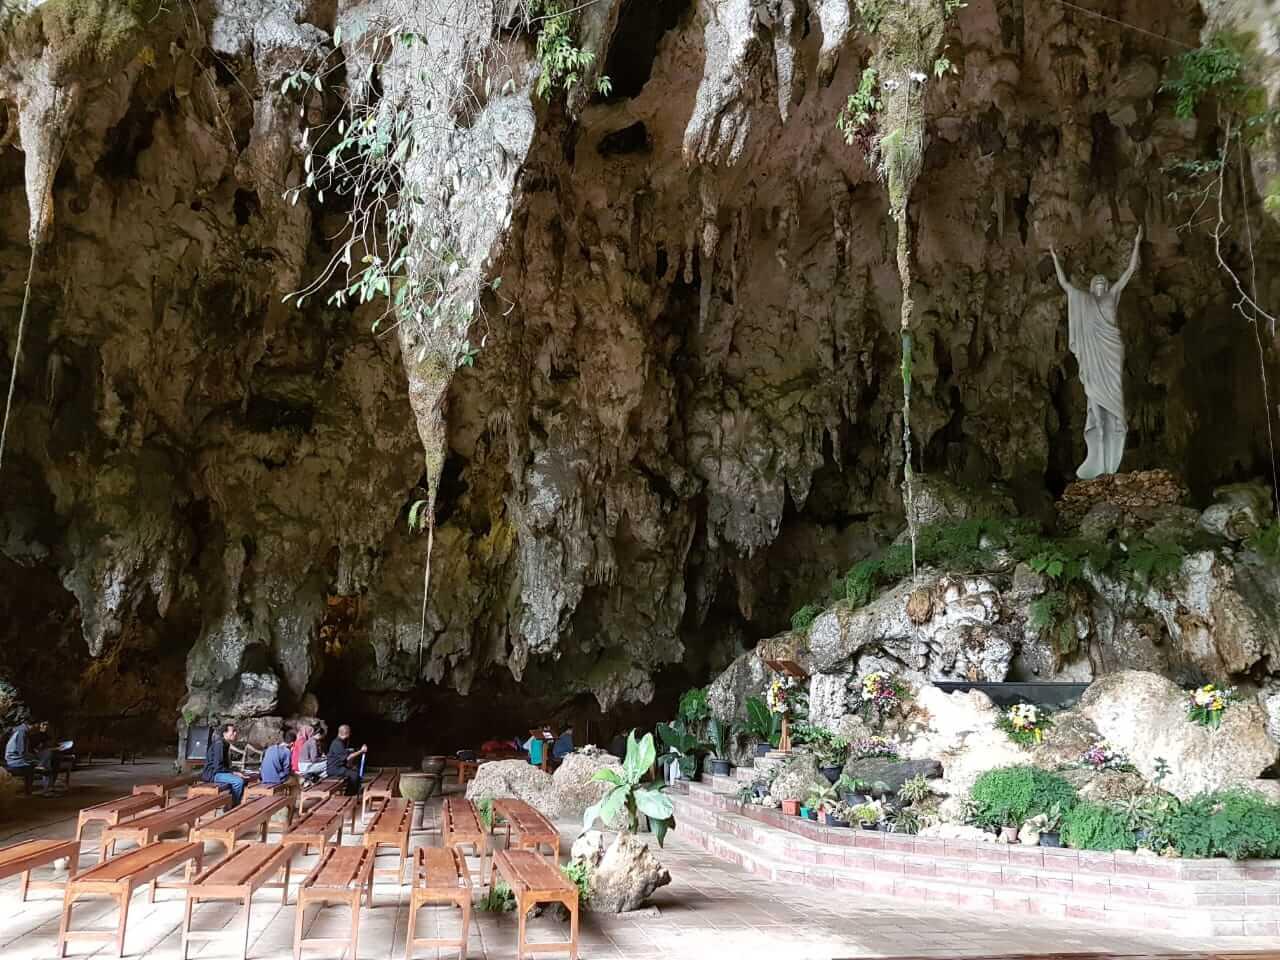 gua maria tritis gunungkidul